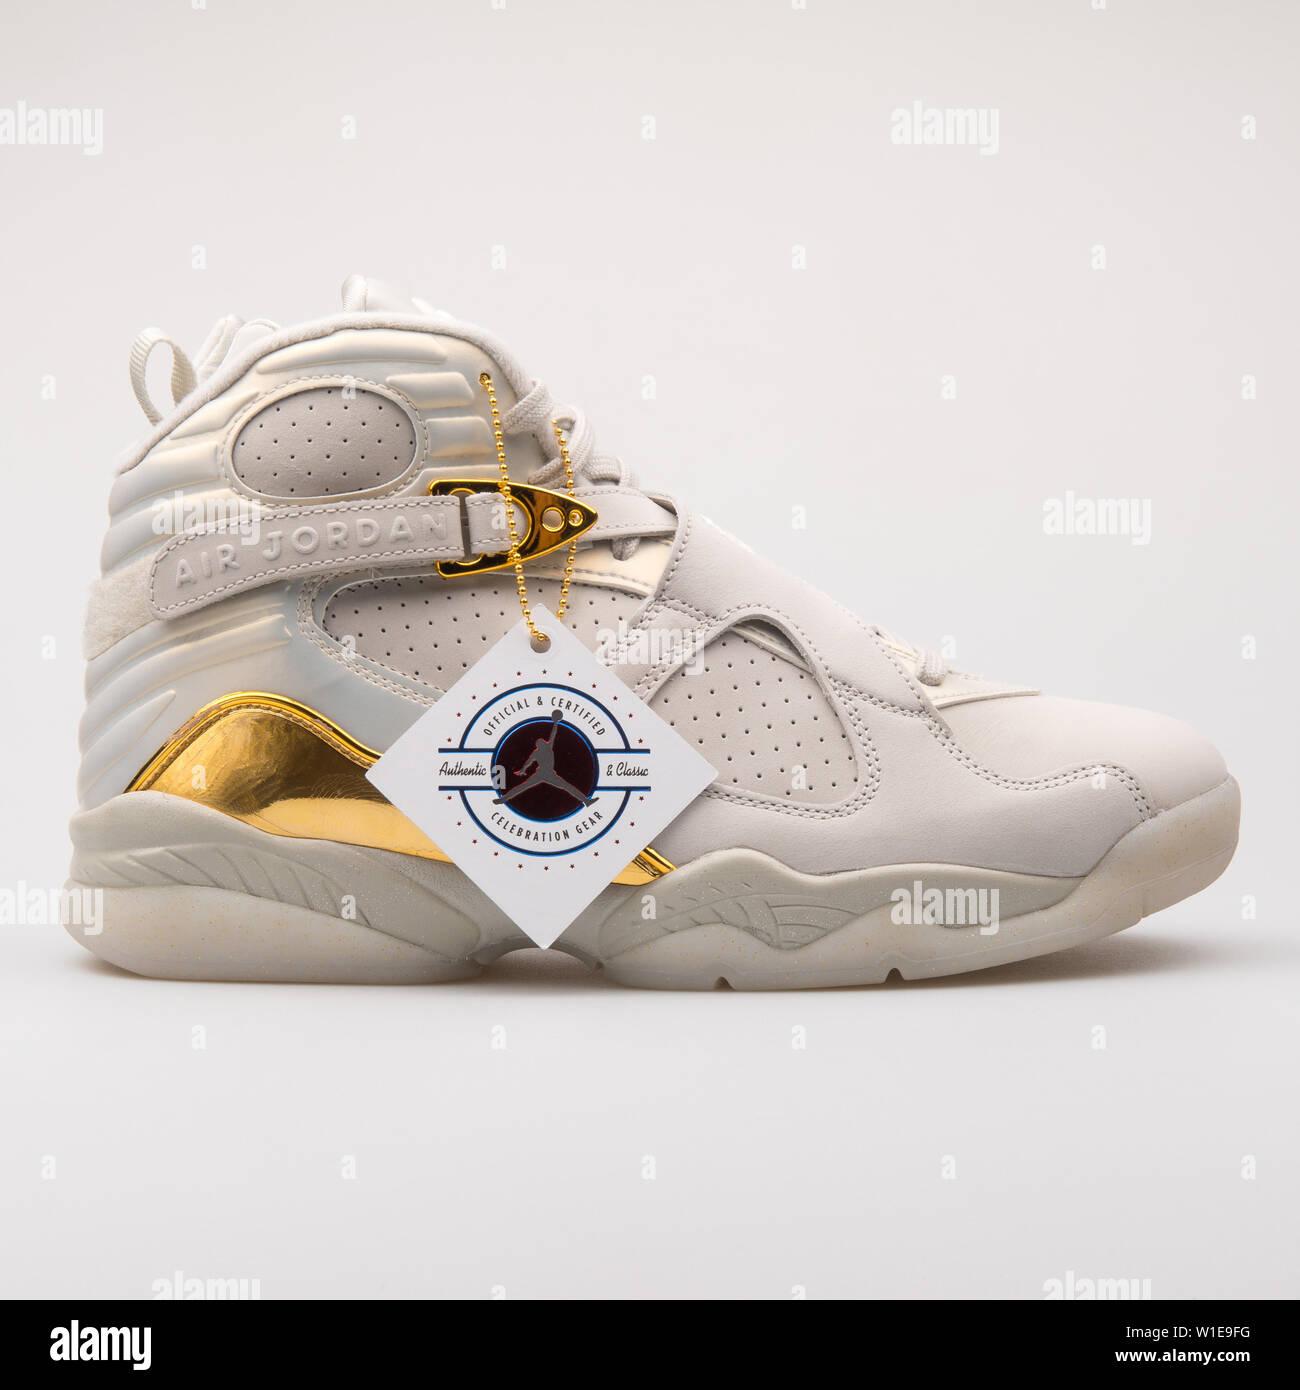 VIENNA, AUSTRIA JUNE 14, 2017: Nike Air Jordan 8 Retro white,..